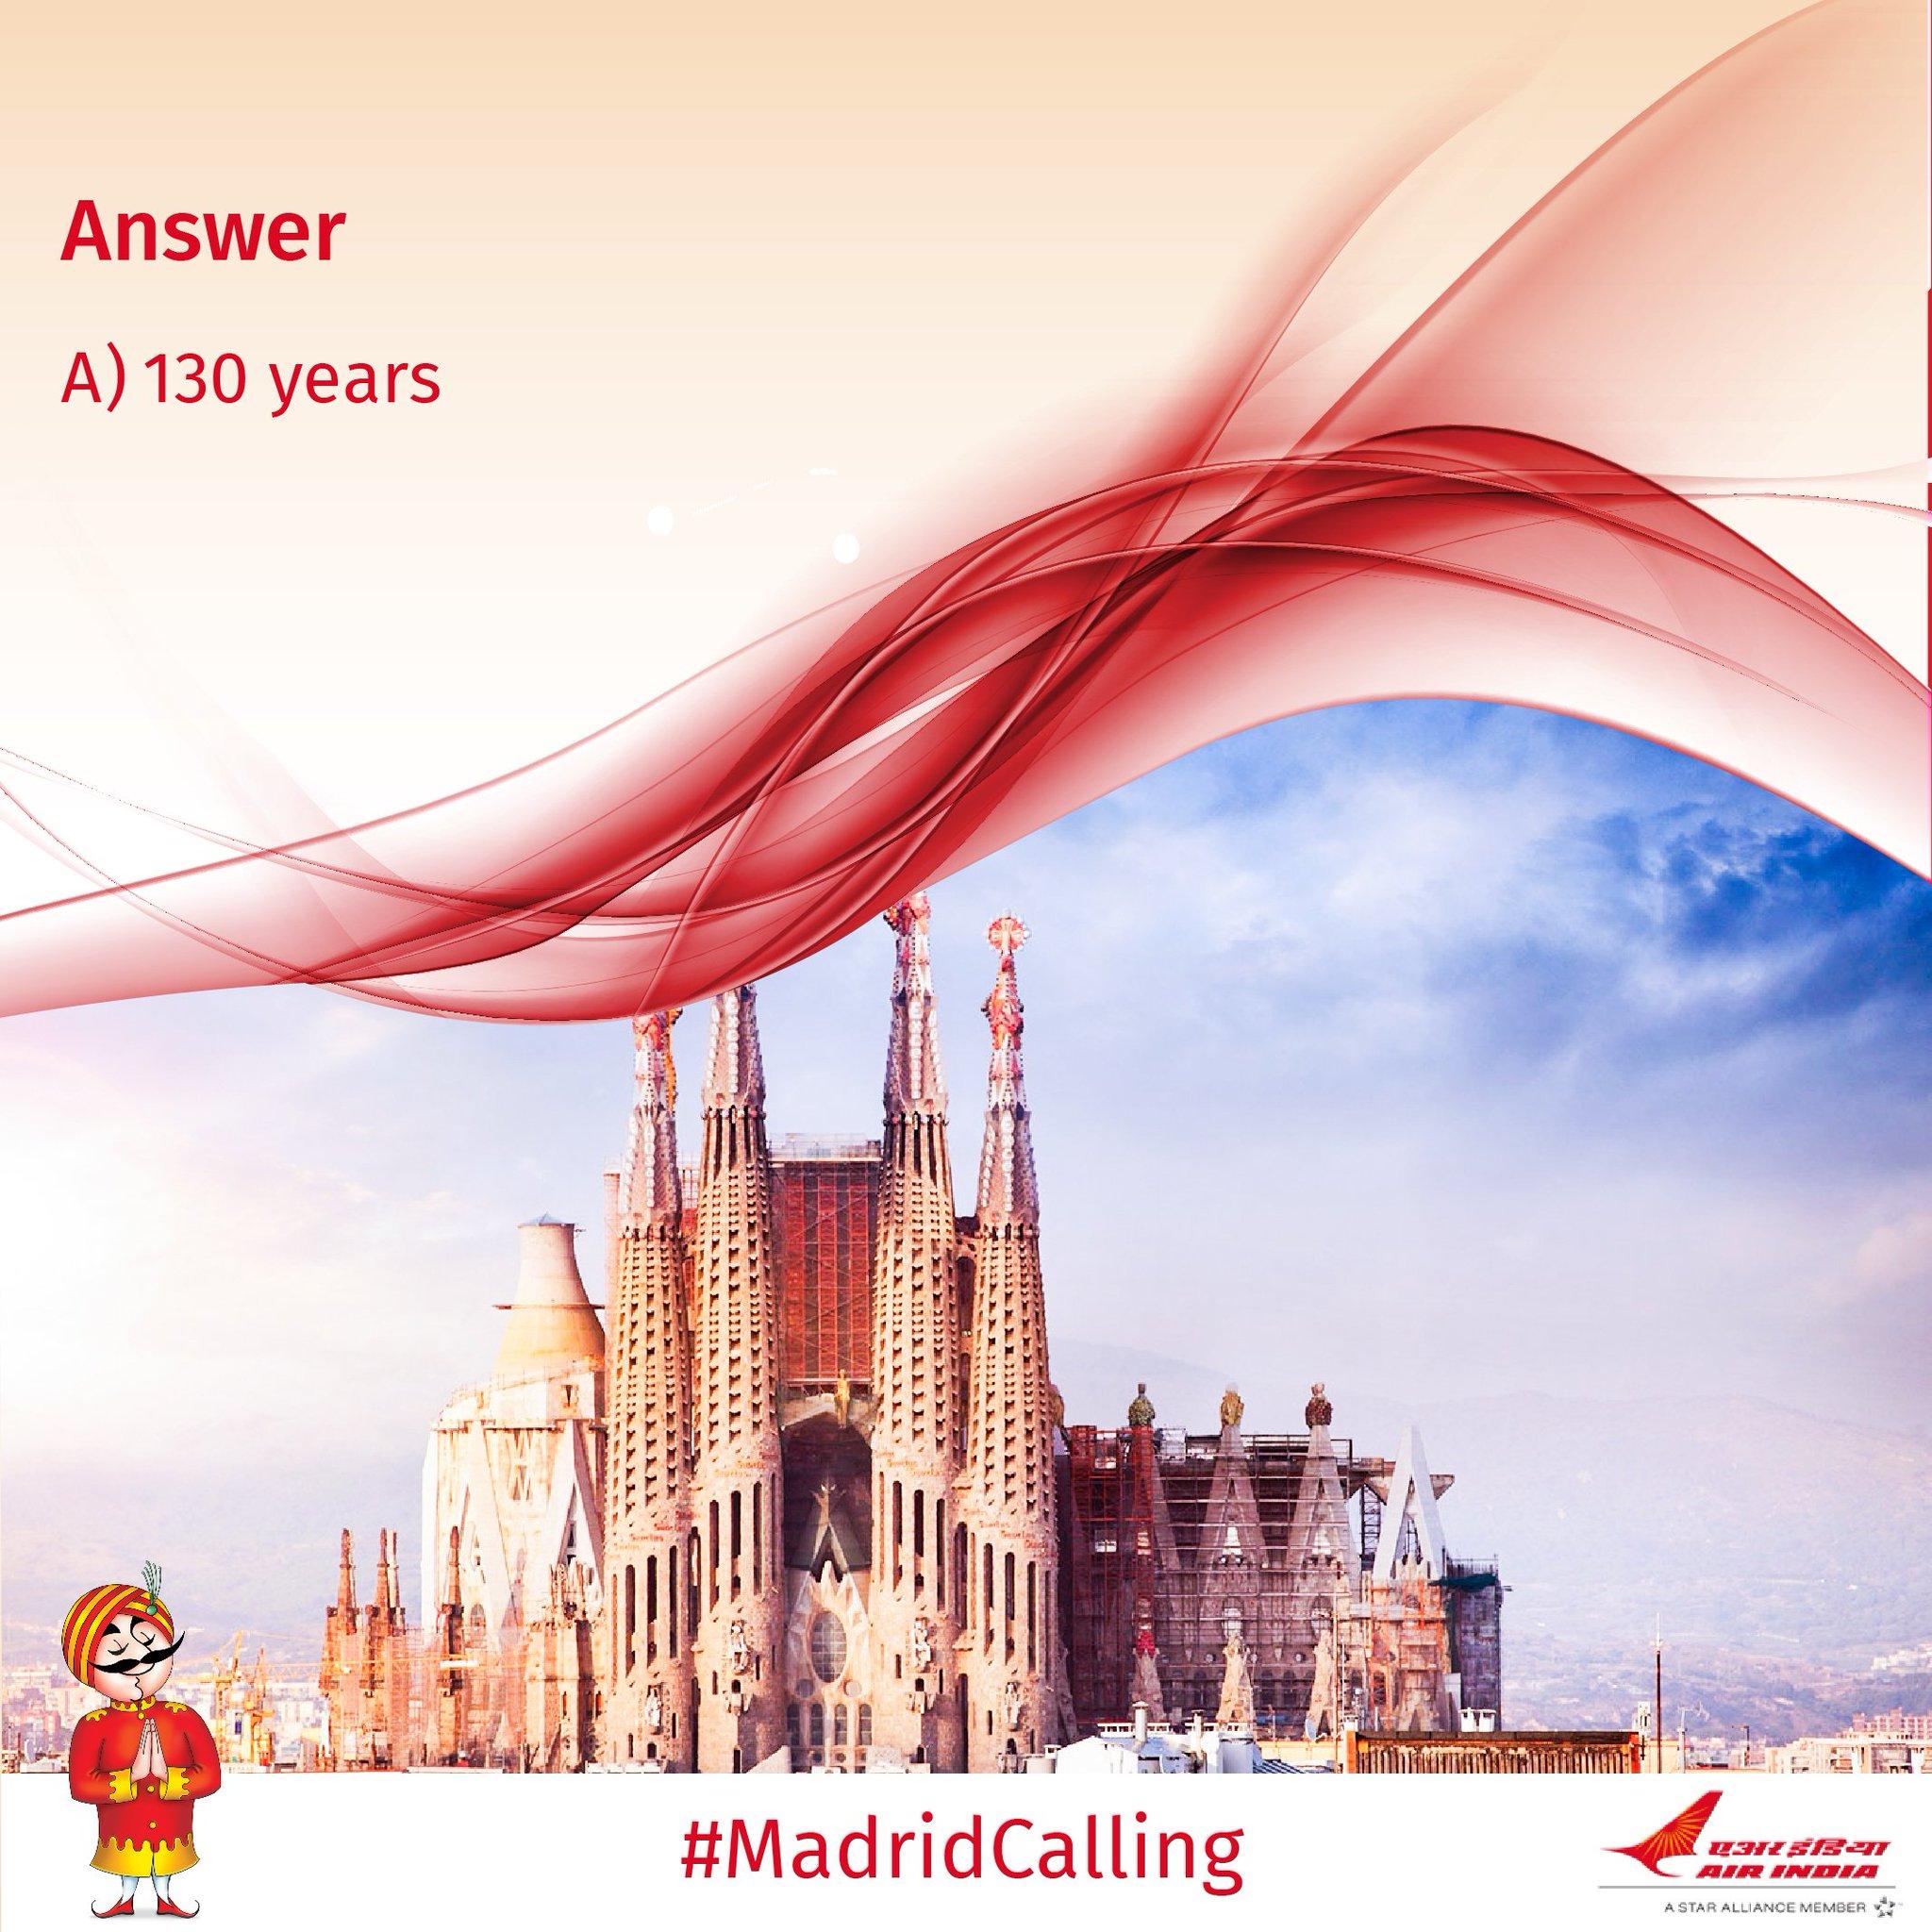 #MadridCalling  #Contest  #Answer5  #FlyAI https://t.co/I2kMVgbejX